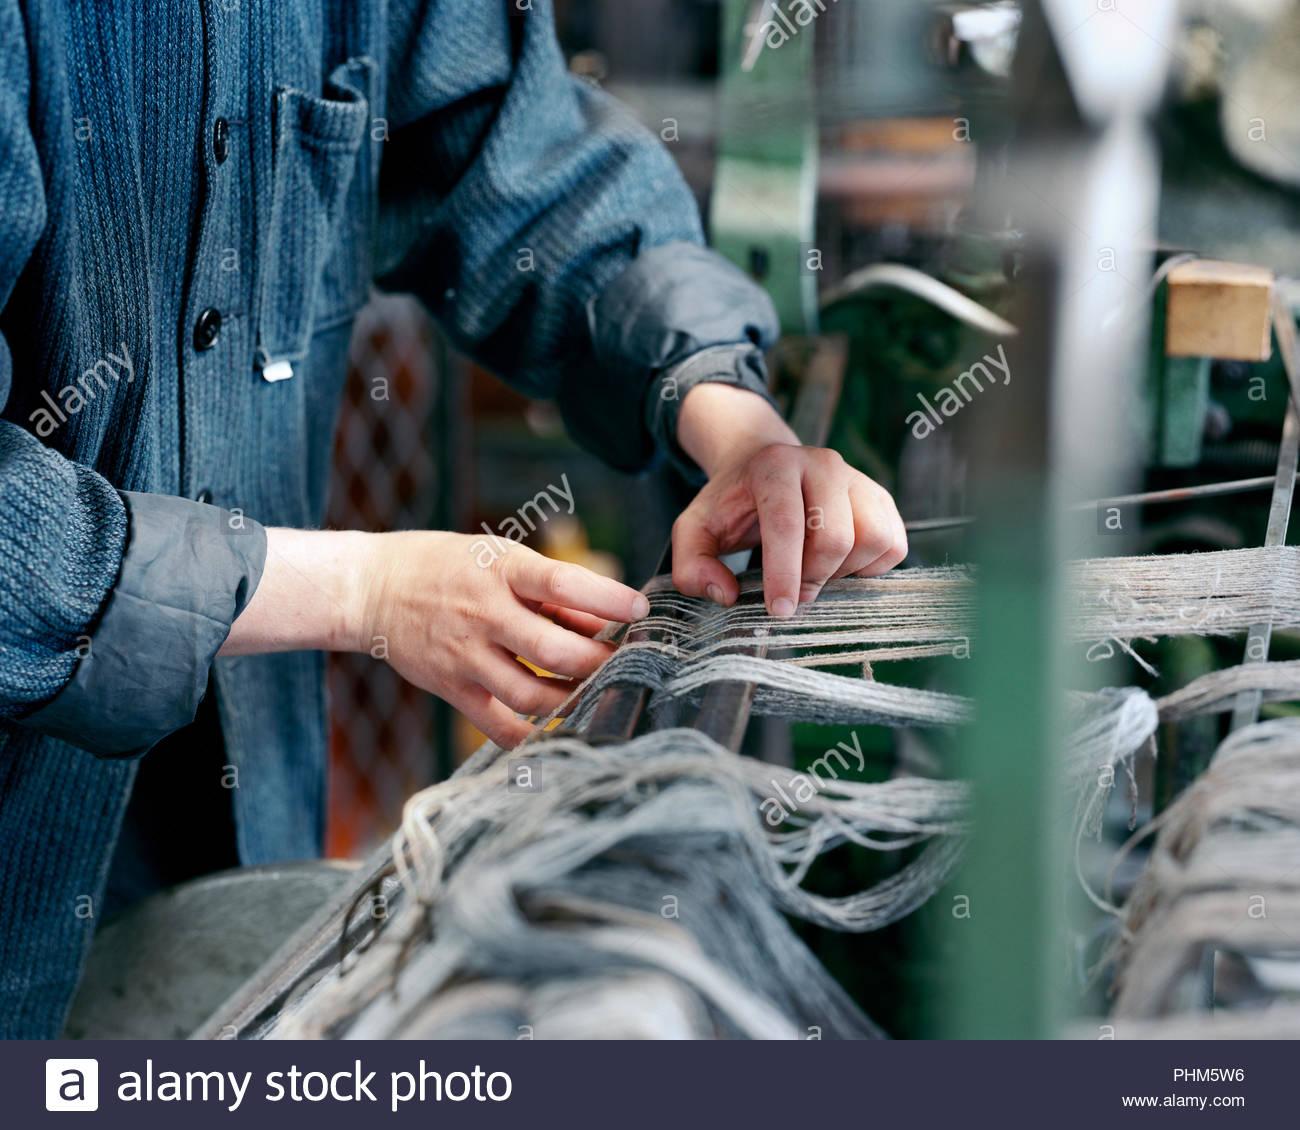 Woman using loom - Stock Image